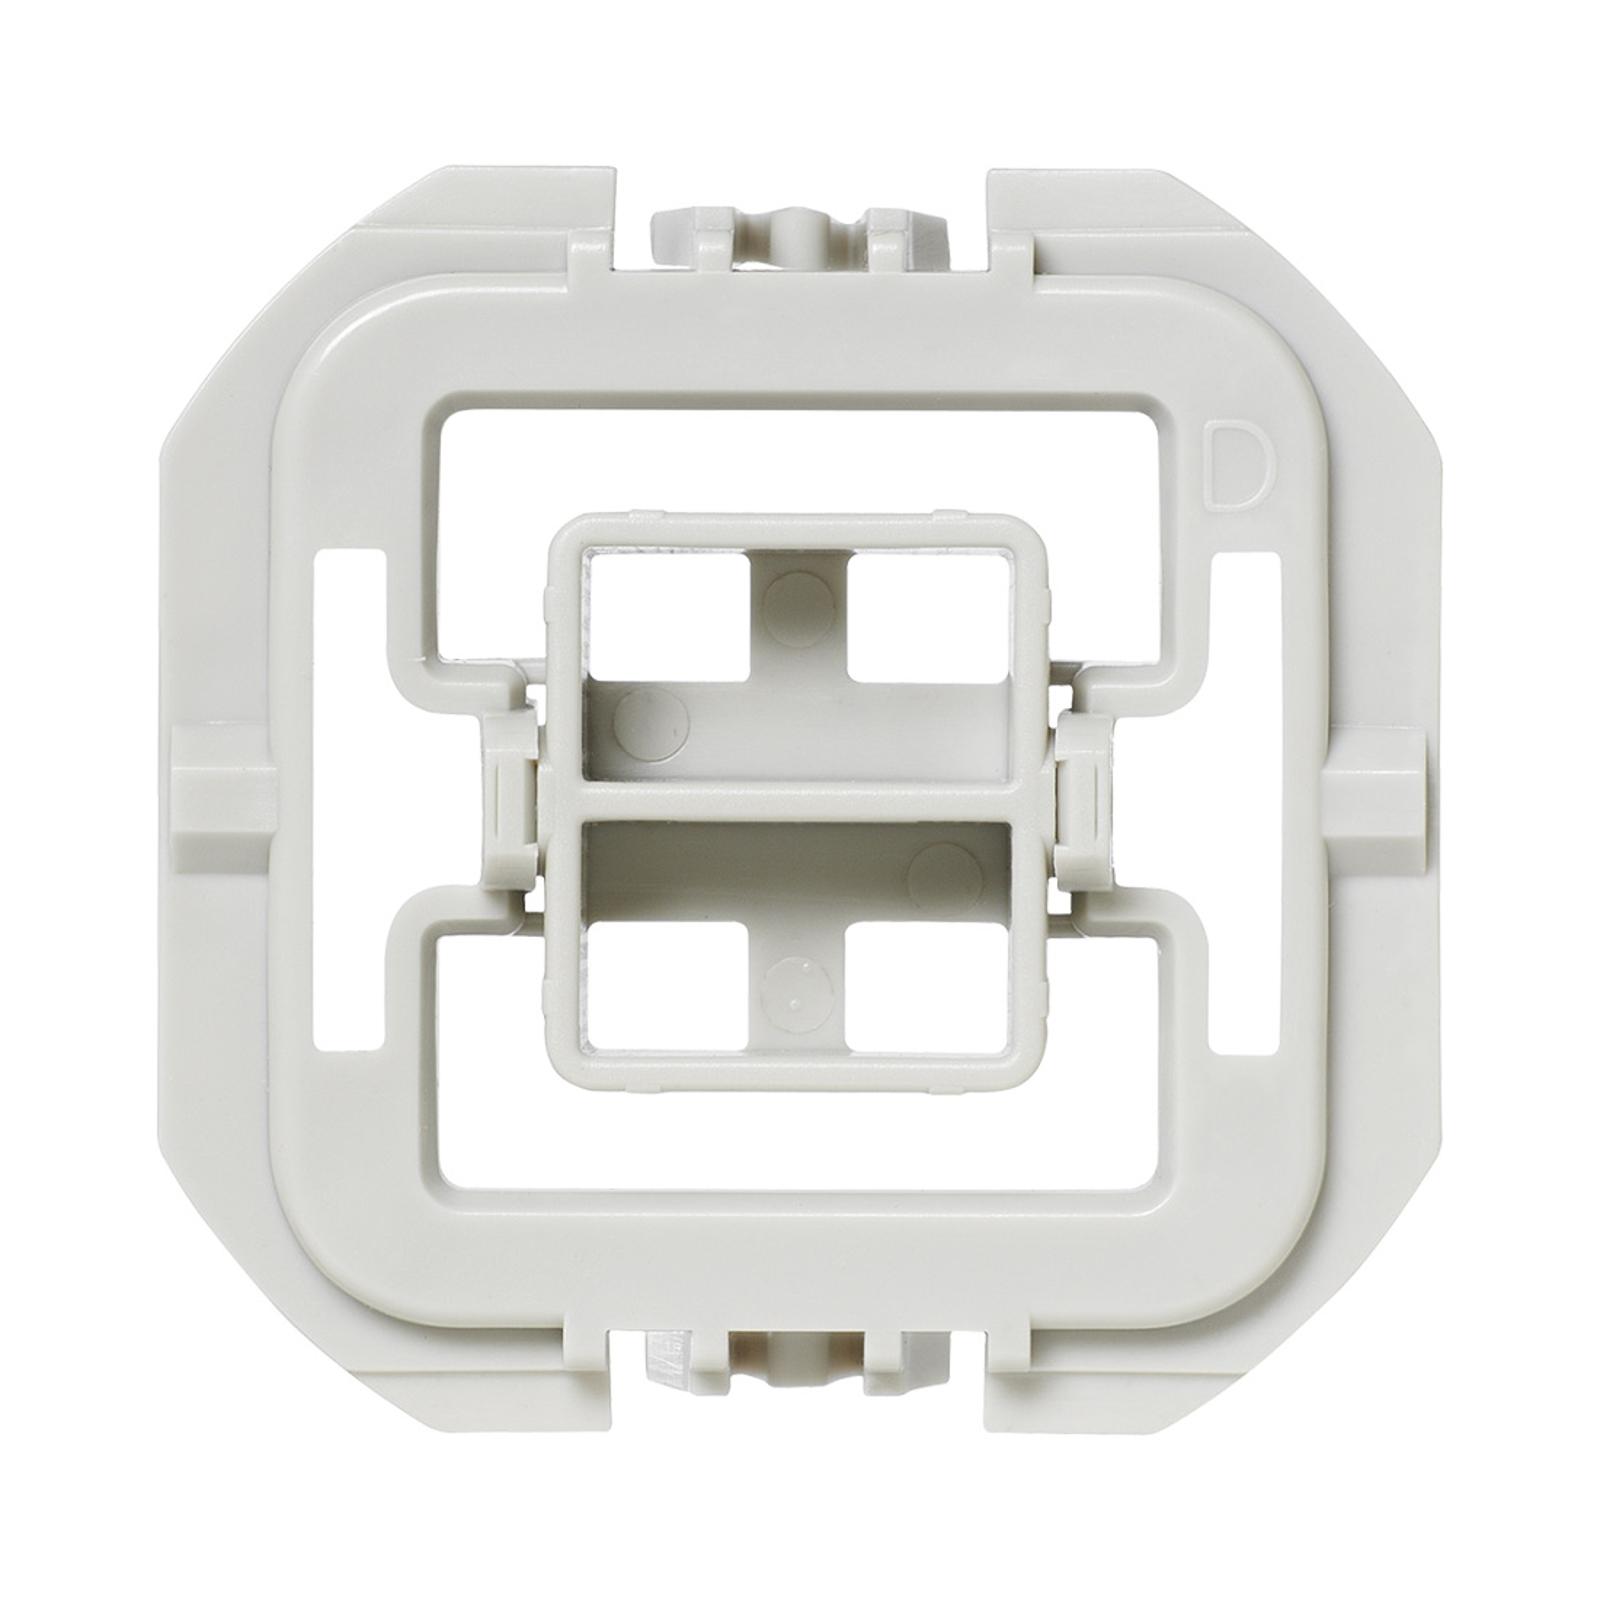 Homematic IP adapter Düwi/REV Ritter 3x